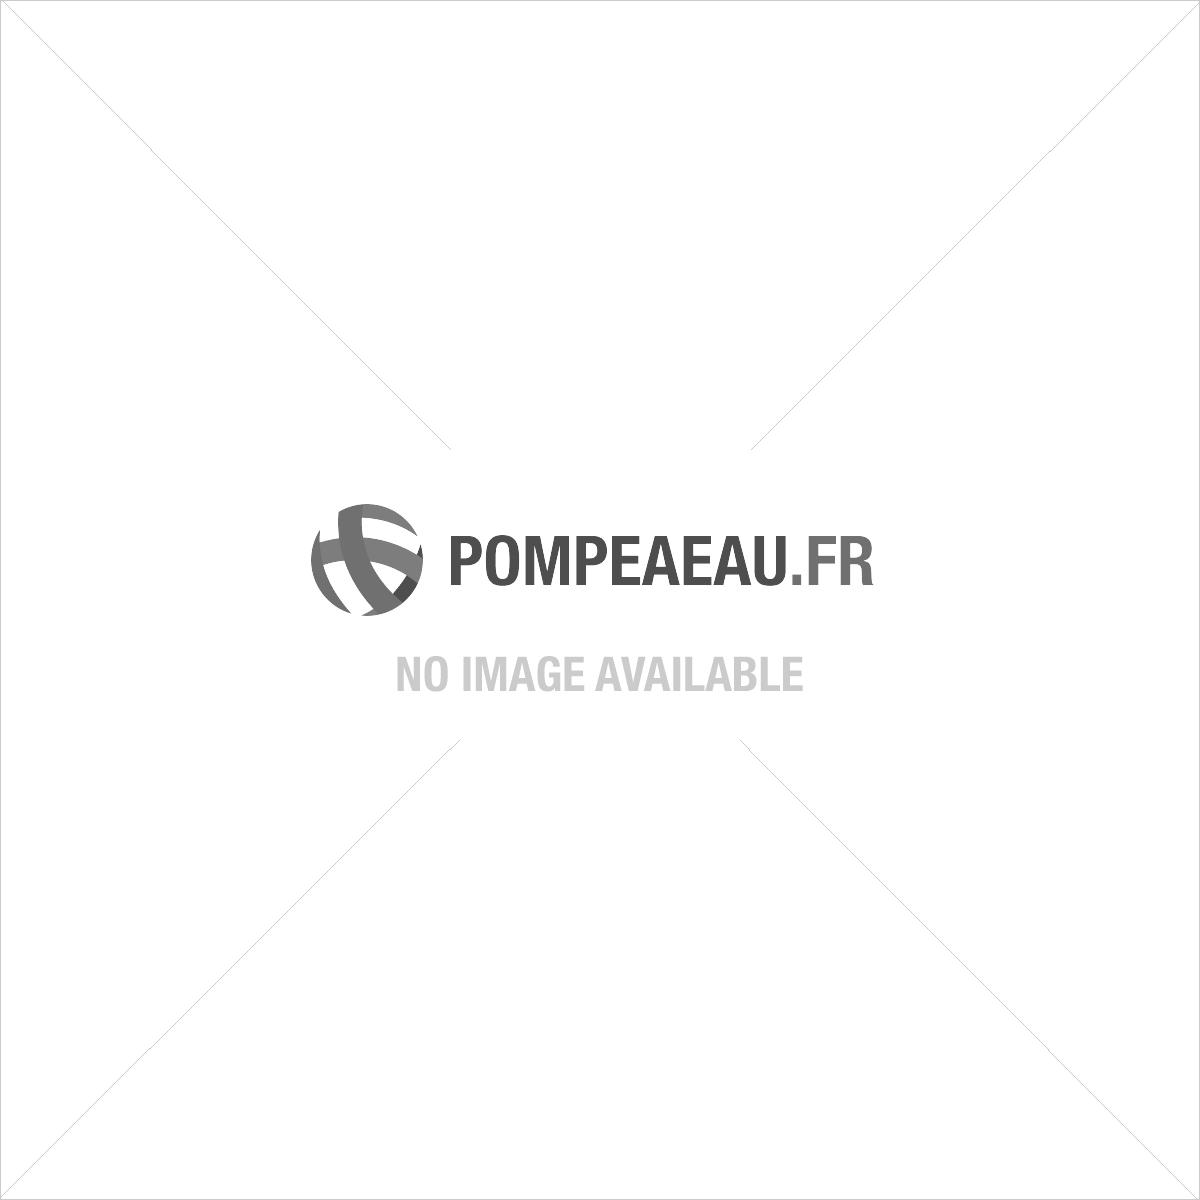 DAB AquaEuroInox 50/50 M 80 L Pompe surpresseur